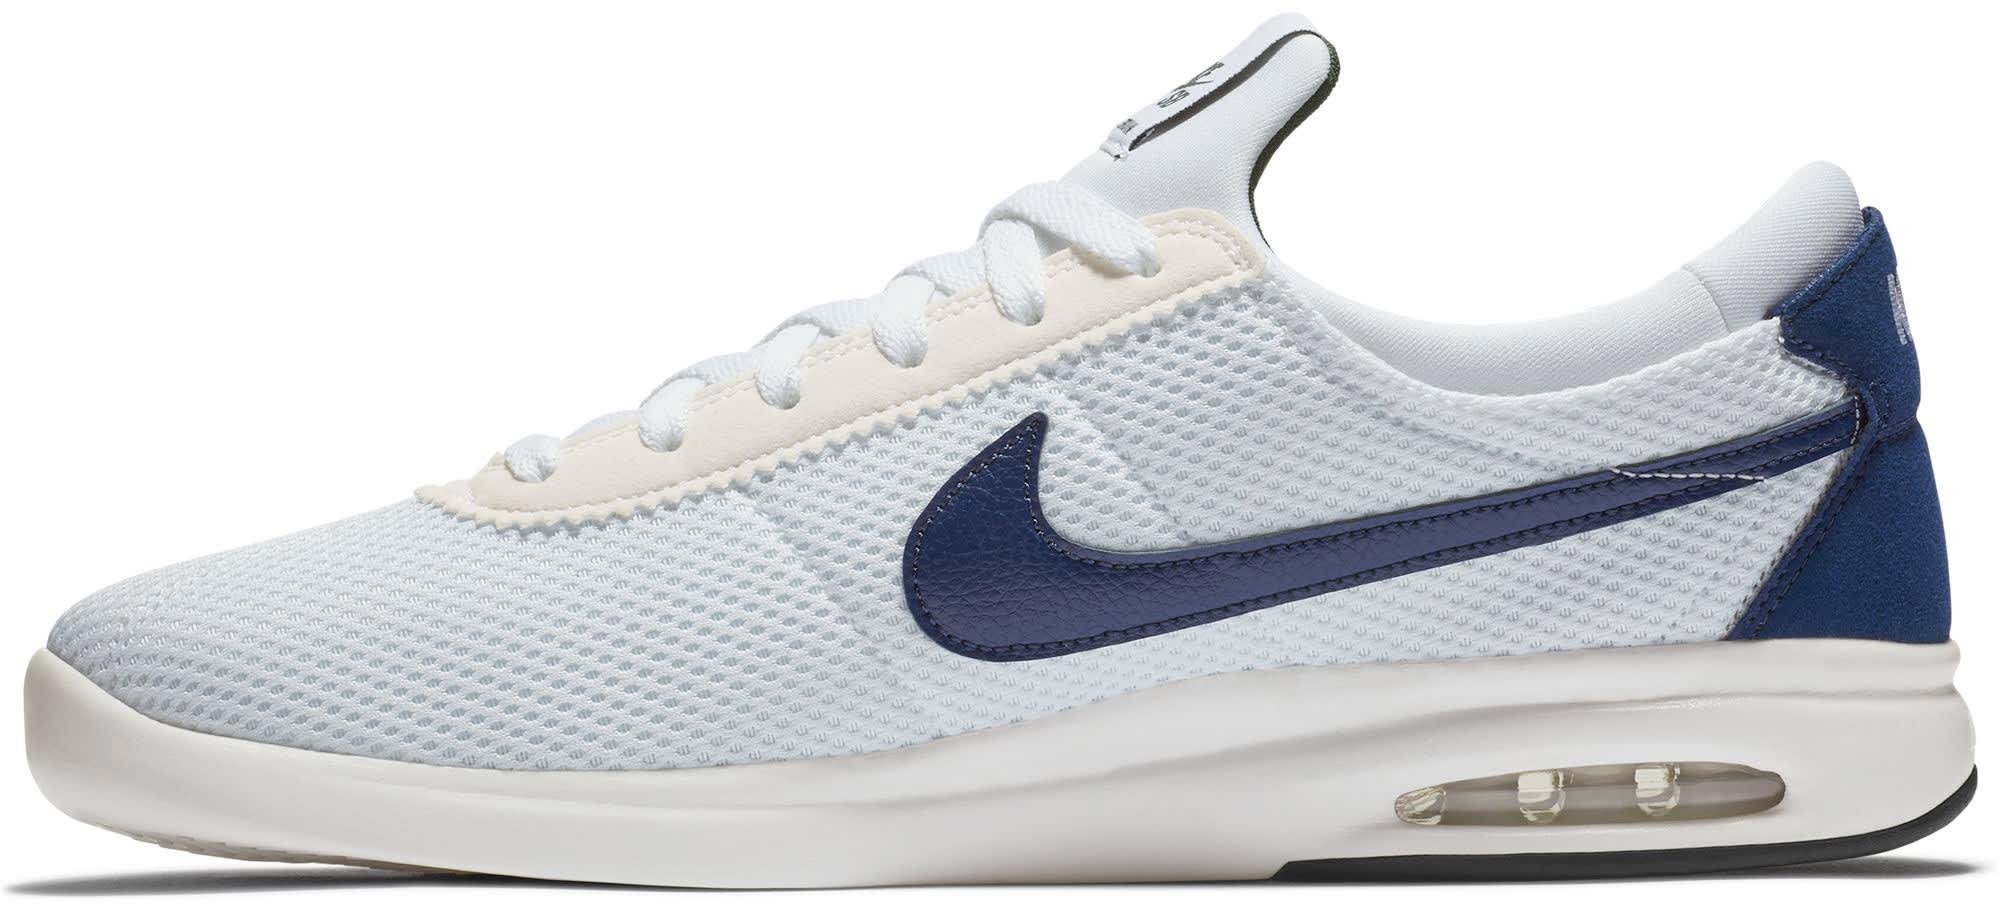 Nike SB Air Max Bruin Vapor Textile Skate Shoes - thumbnail 3 b4bc10455d